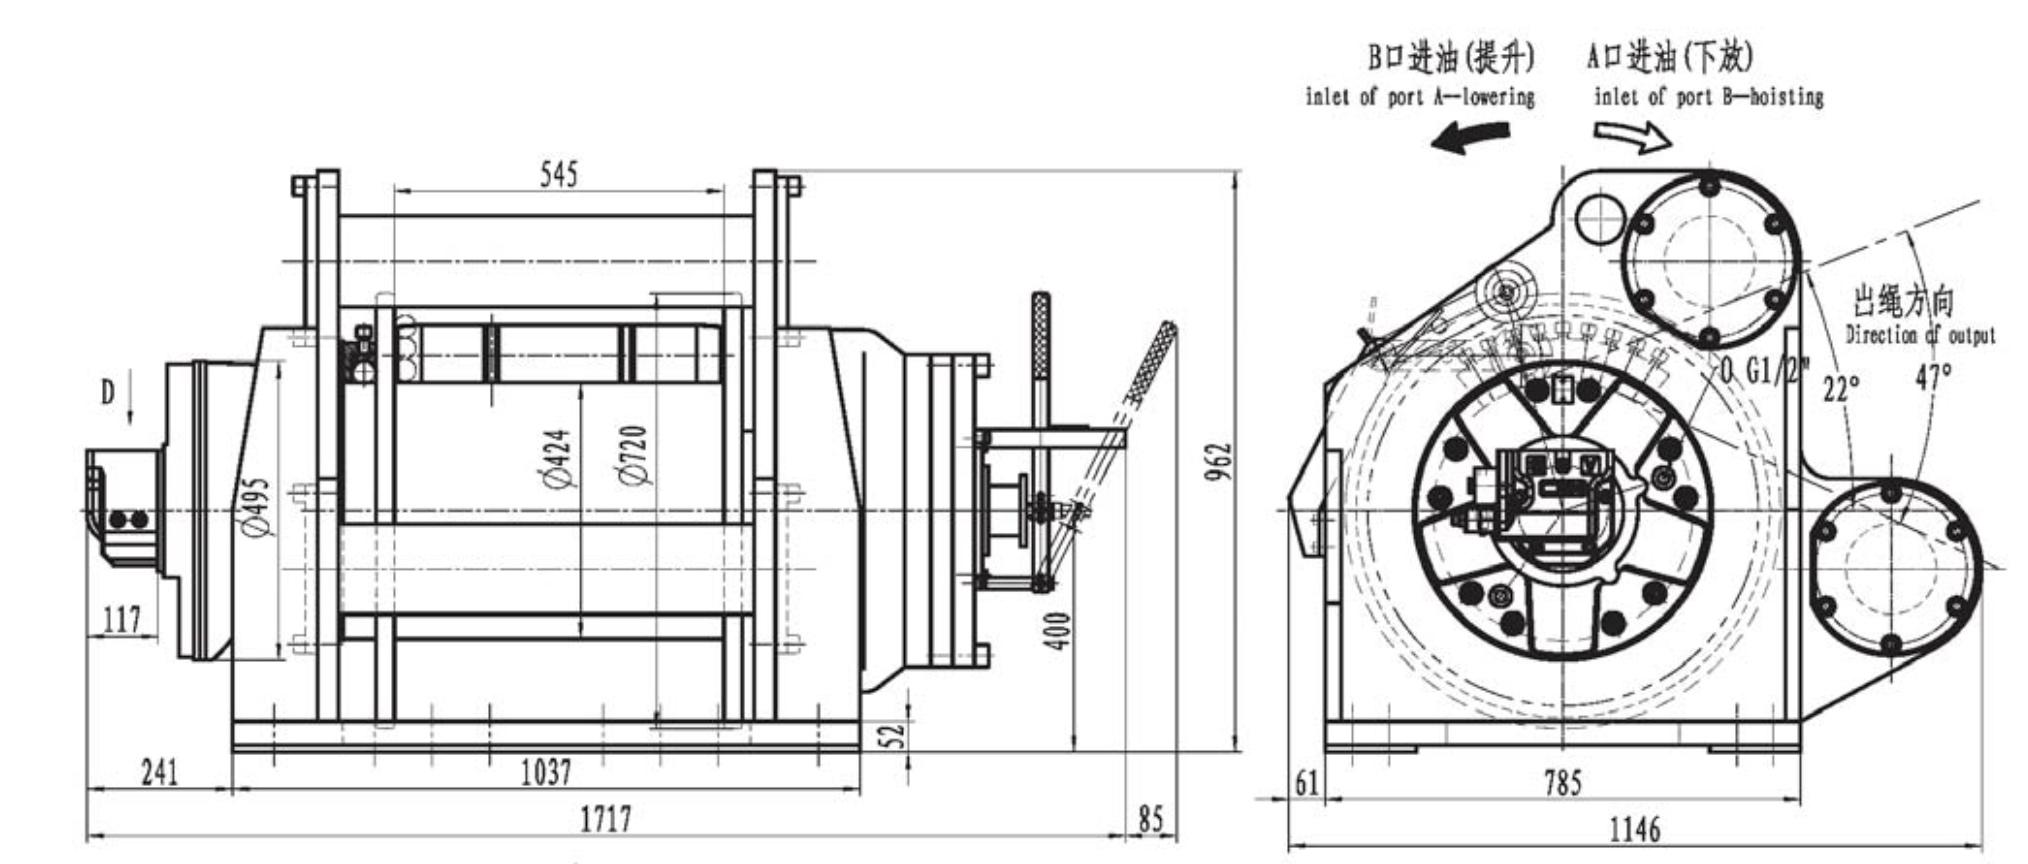 vehicle winch configuration